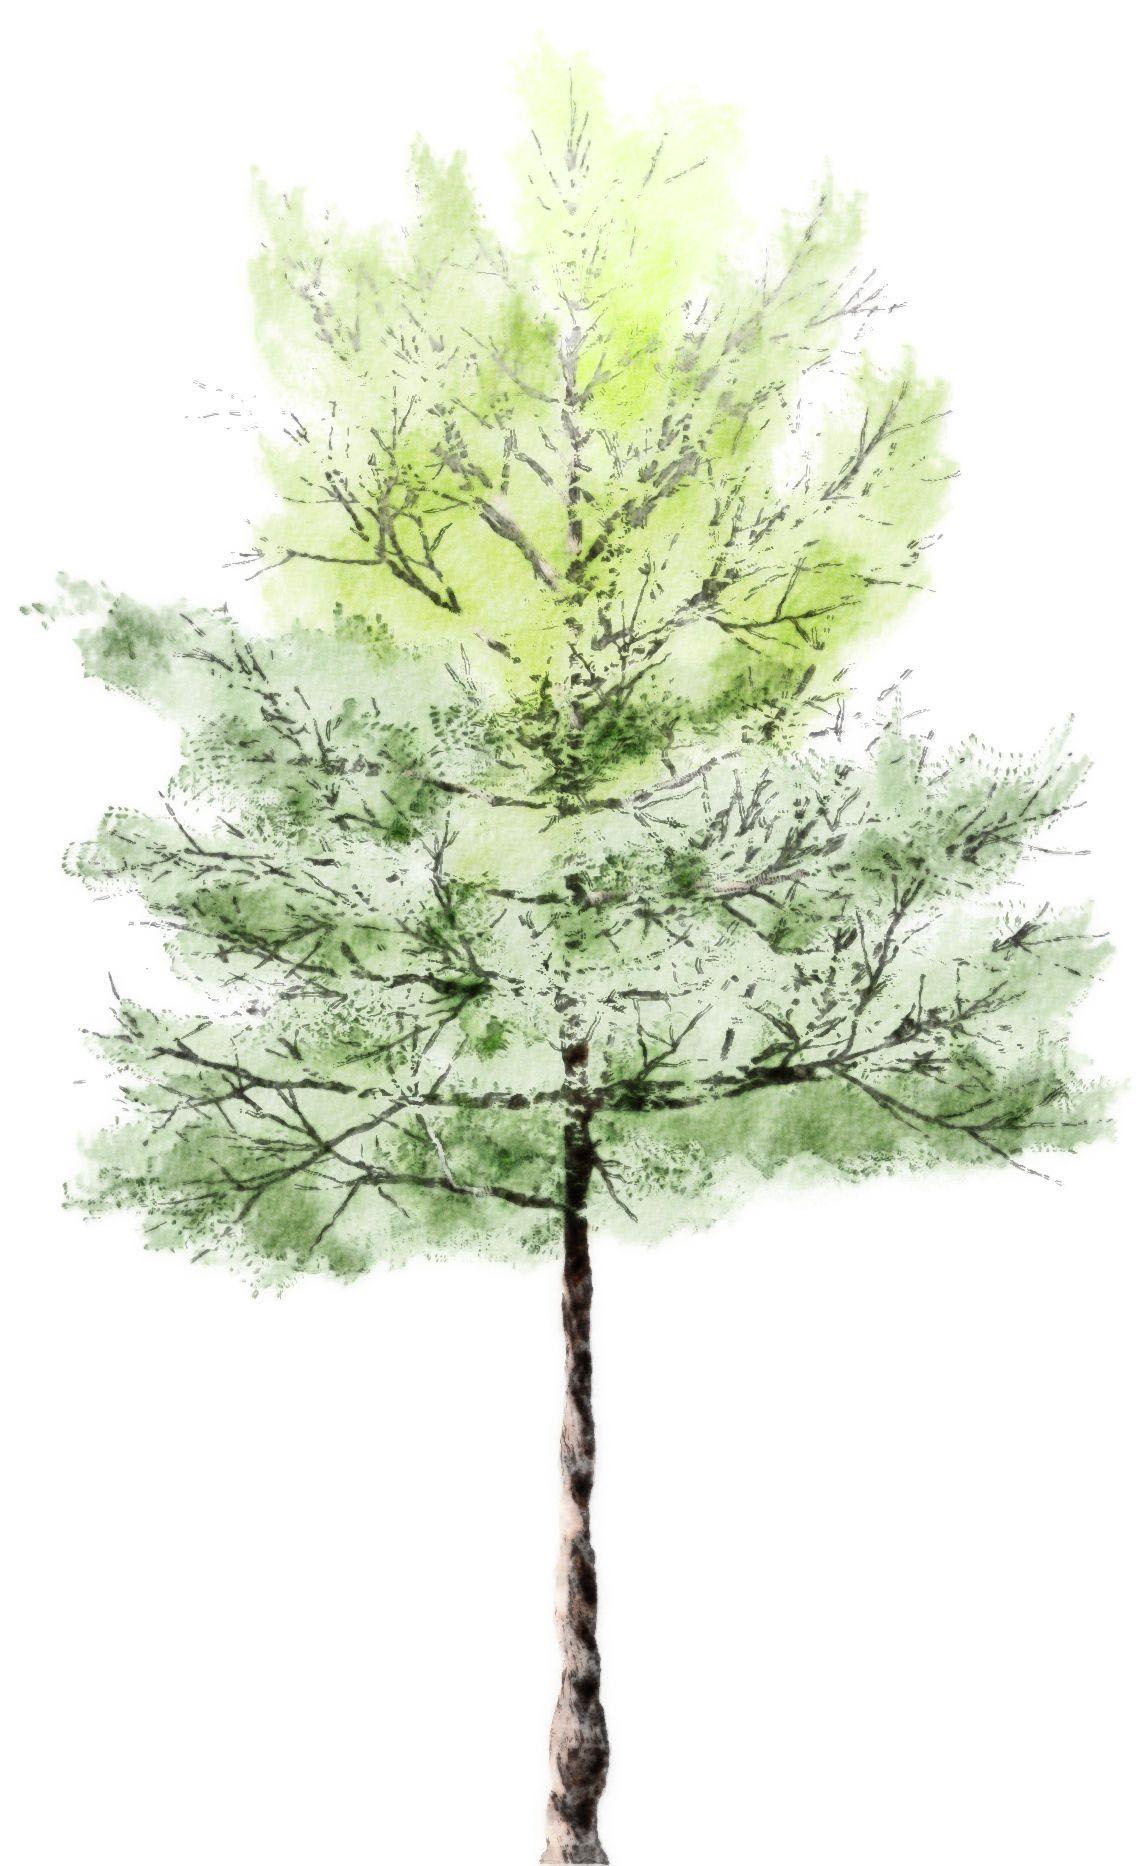 watercolor tree | pretty | Pinterest | Watercolor trees, Watercolor ...